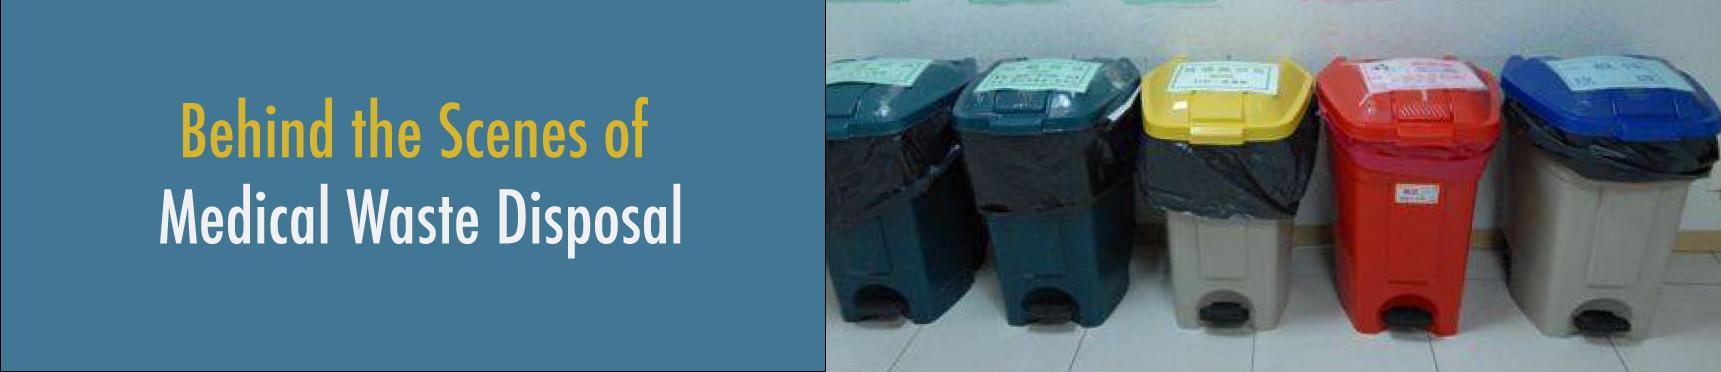 Behind the Scenes of Medical Waste Disposal